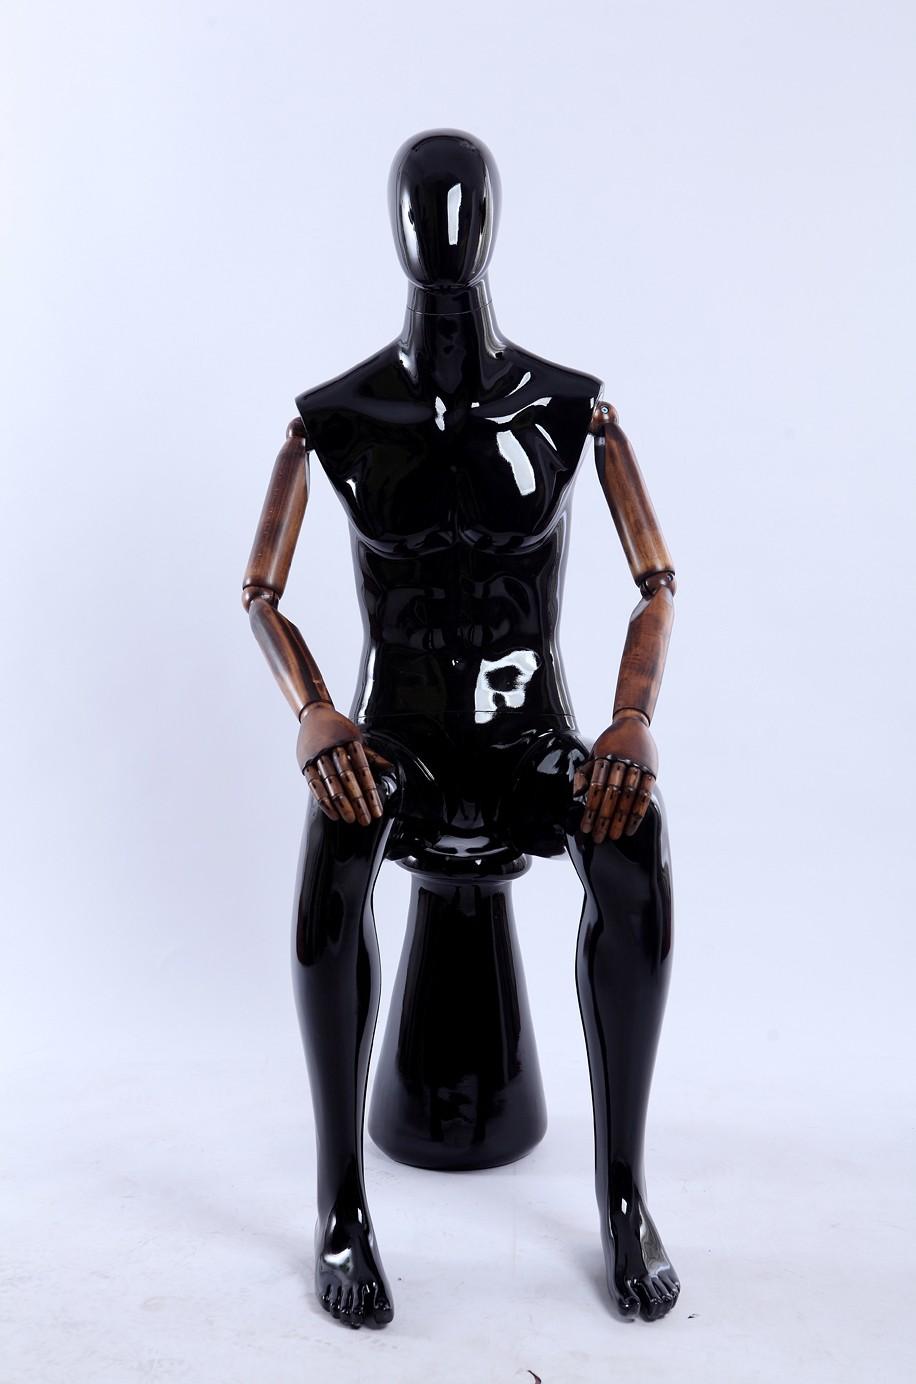 Mallinukke Miehet Glossy Musta